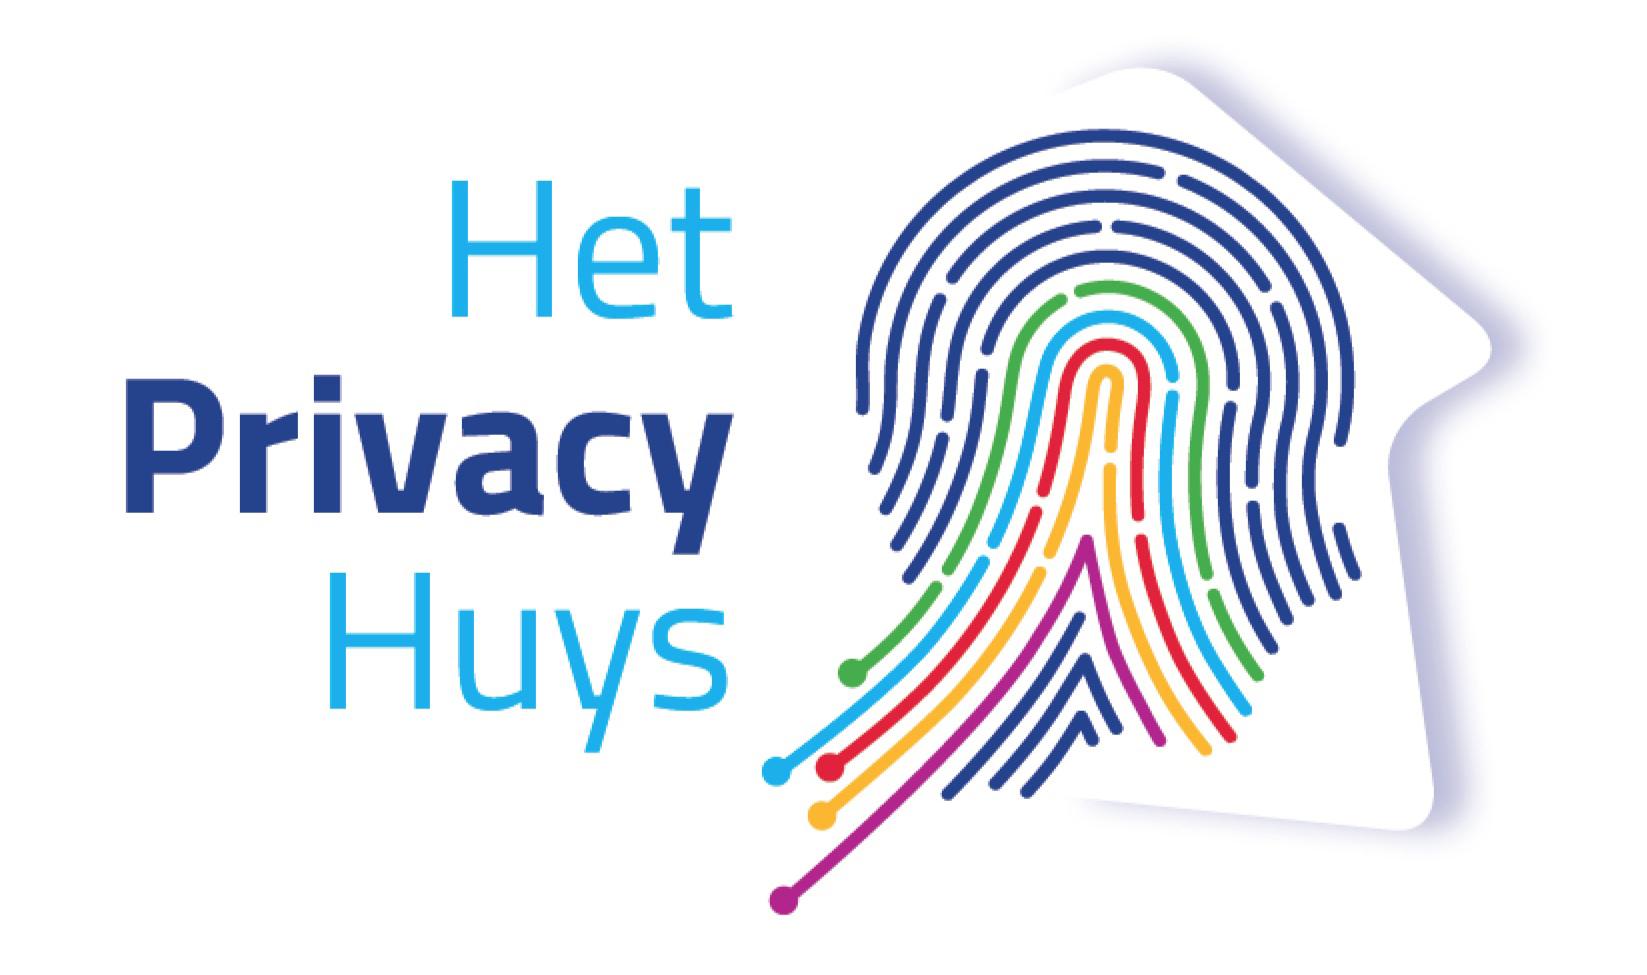 Het Privacy Huys